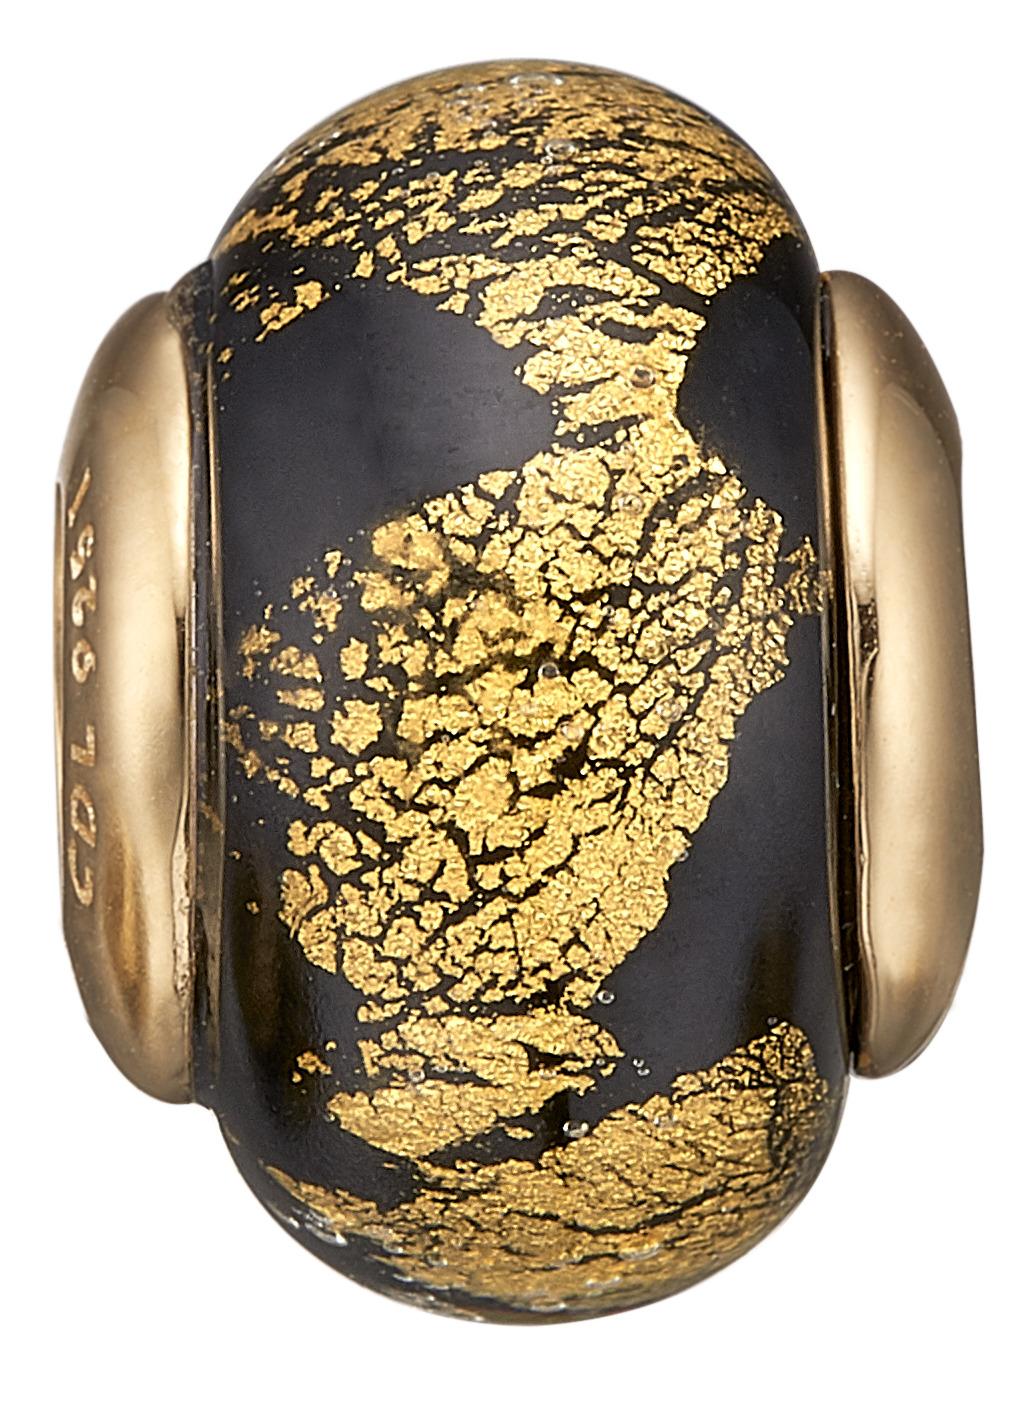 christina watches Christina forgyldt golden black globe - 630-g156 fra brodersen + kobborg